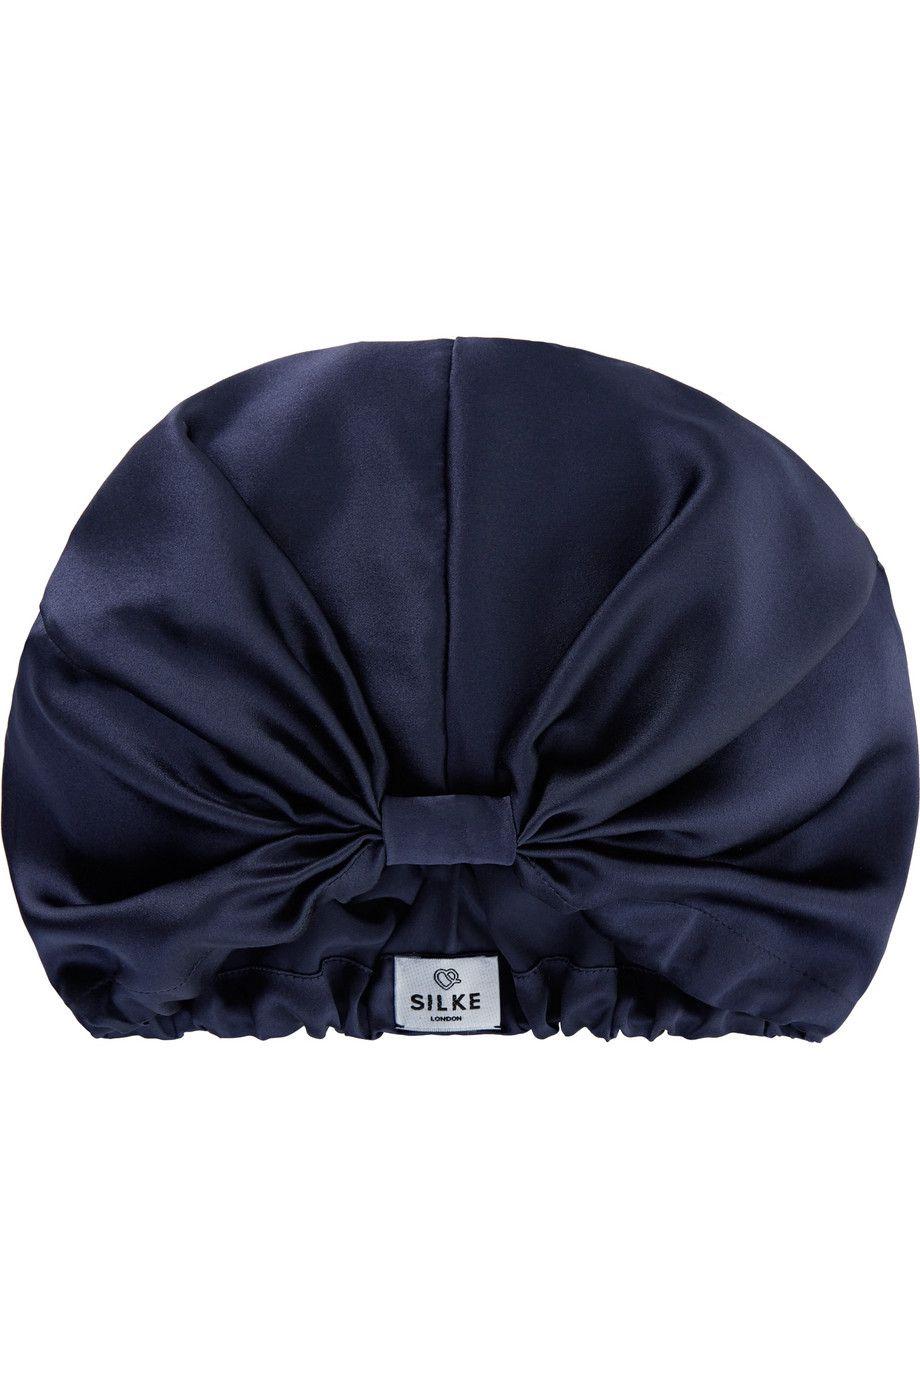 blue hair wrap bonnet